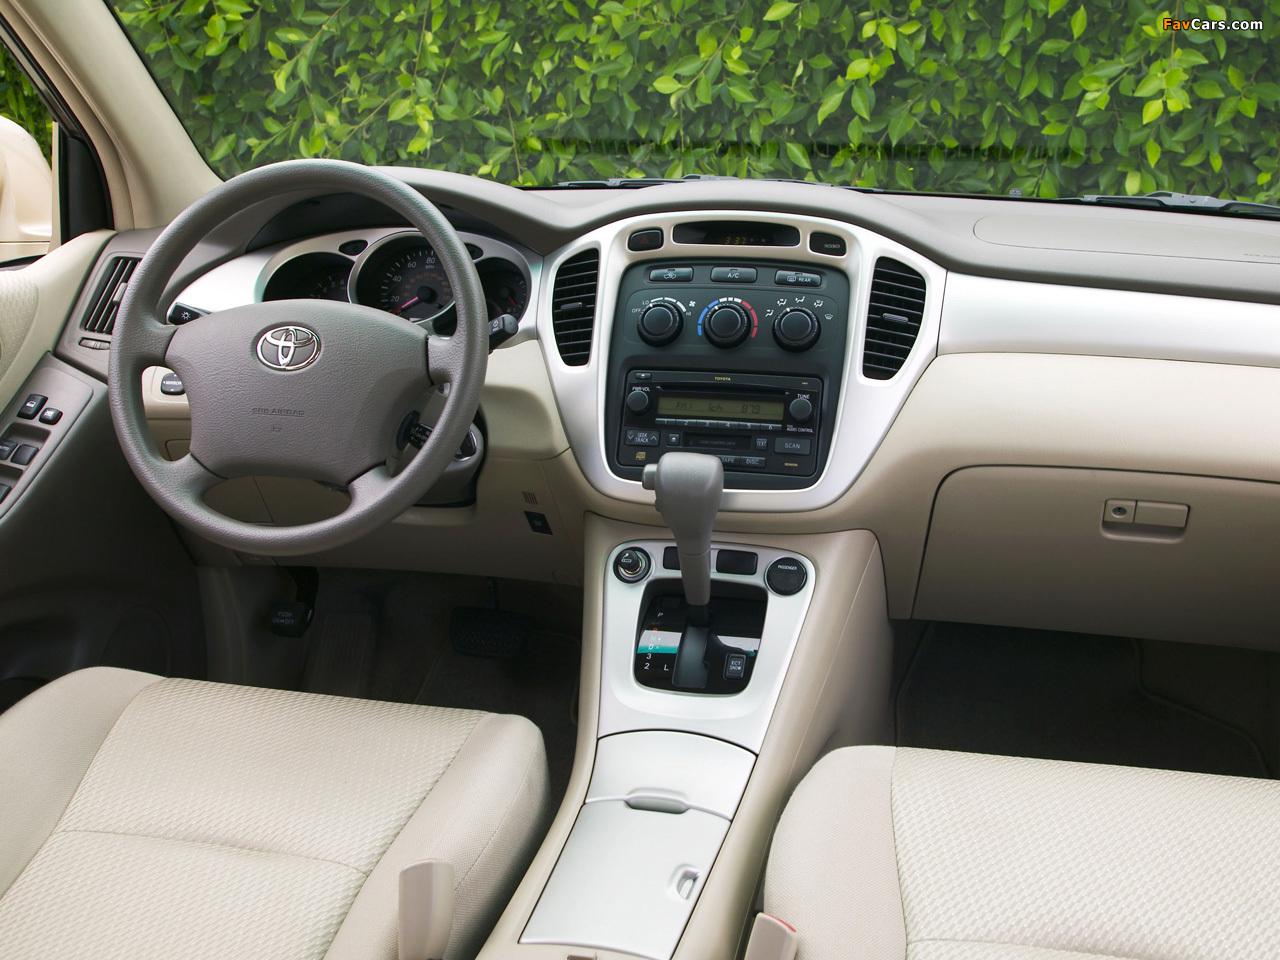 Toyota Highlander 2004 технические характеристики